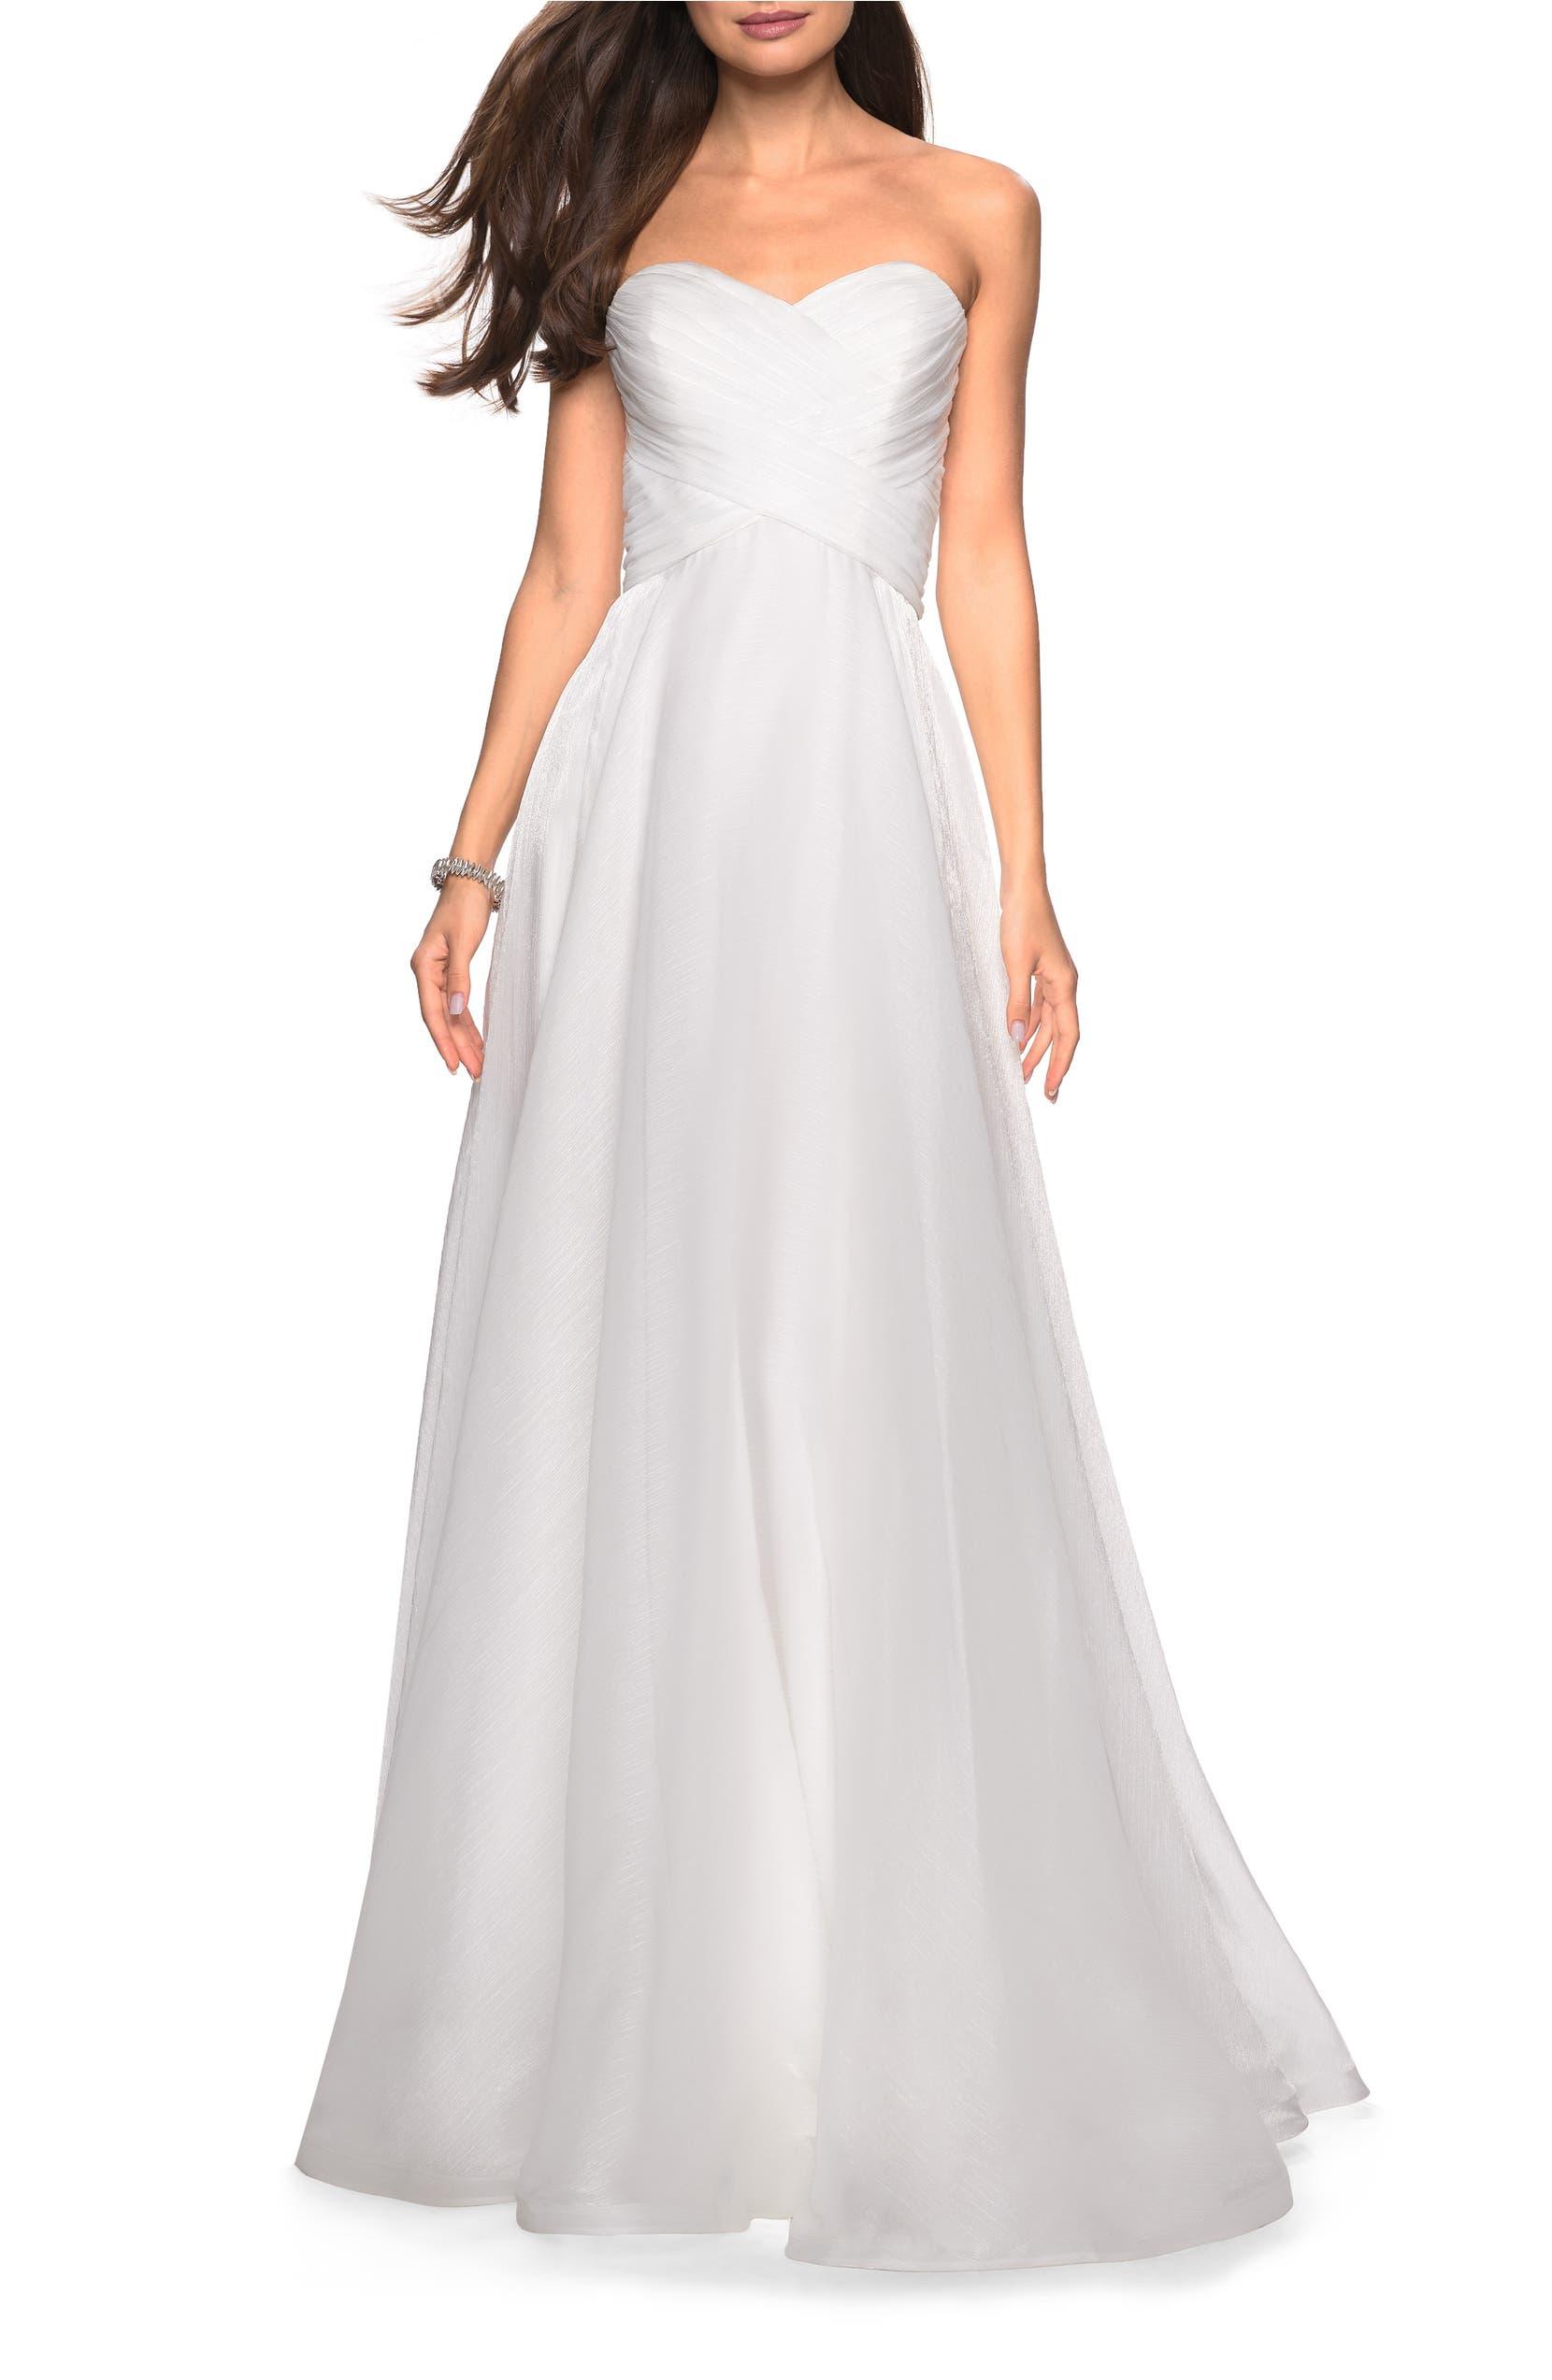 7a0afb66dca63 Strapless Metallic Chiffon Evening Dress